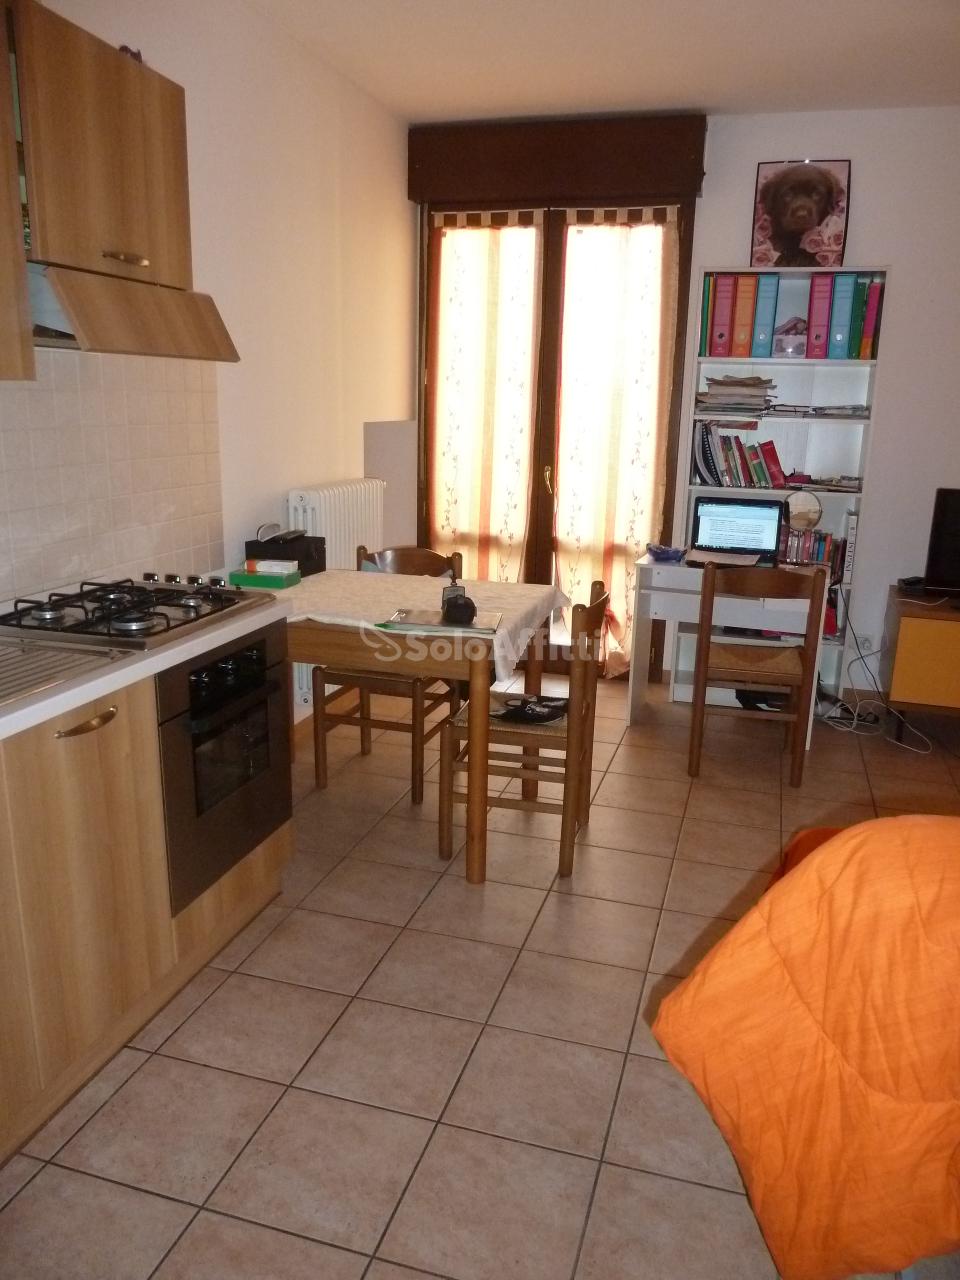 Appartamento in affitto a Santarcangelo Di Romagna (RN)